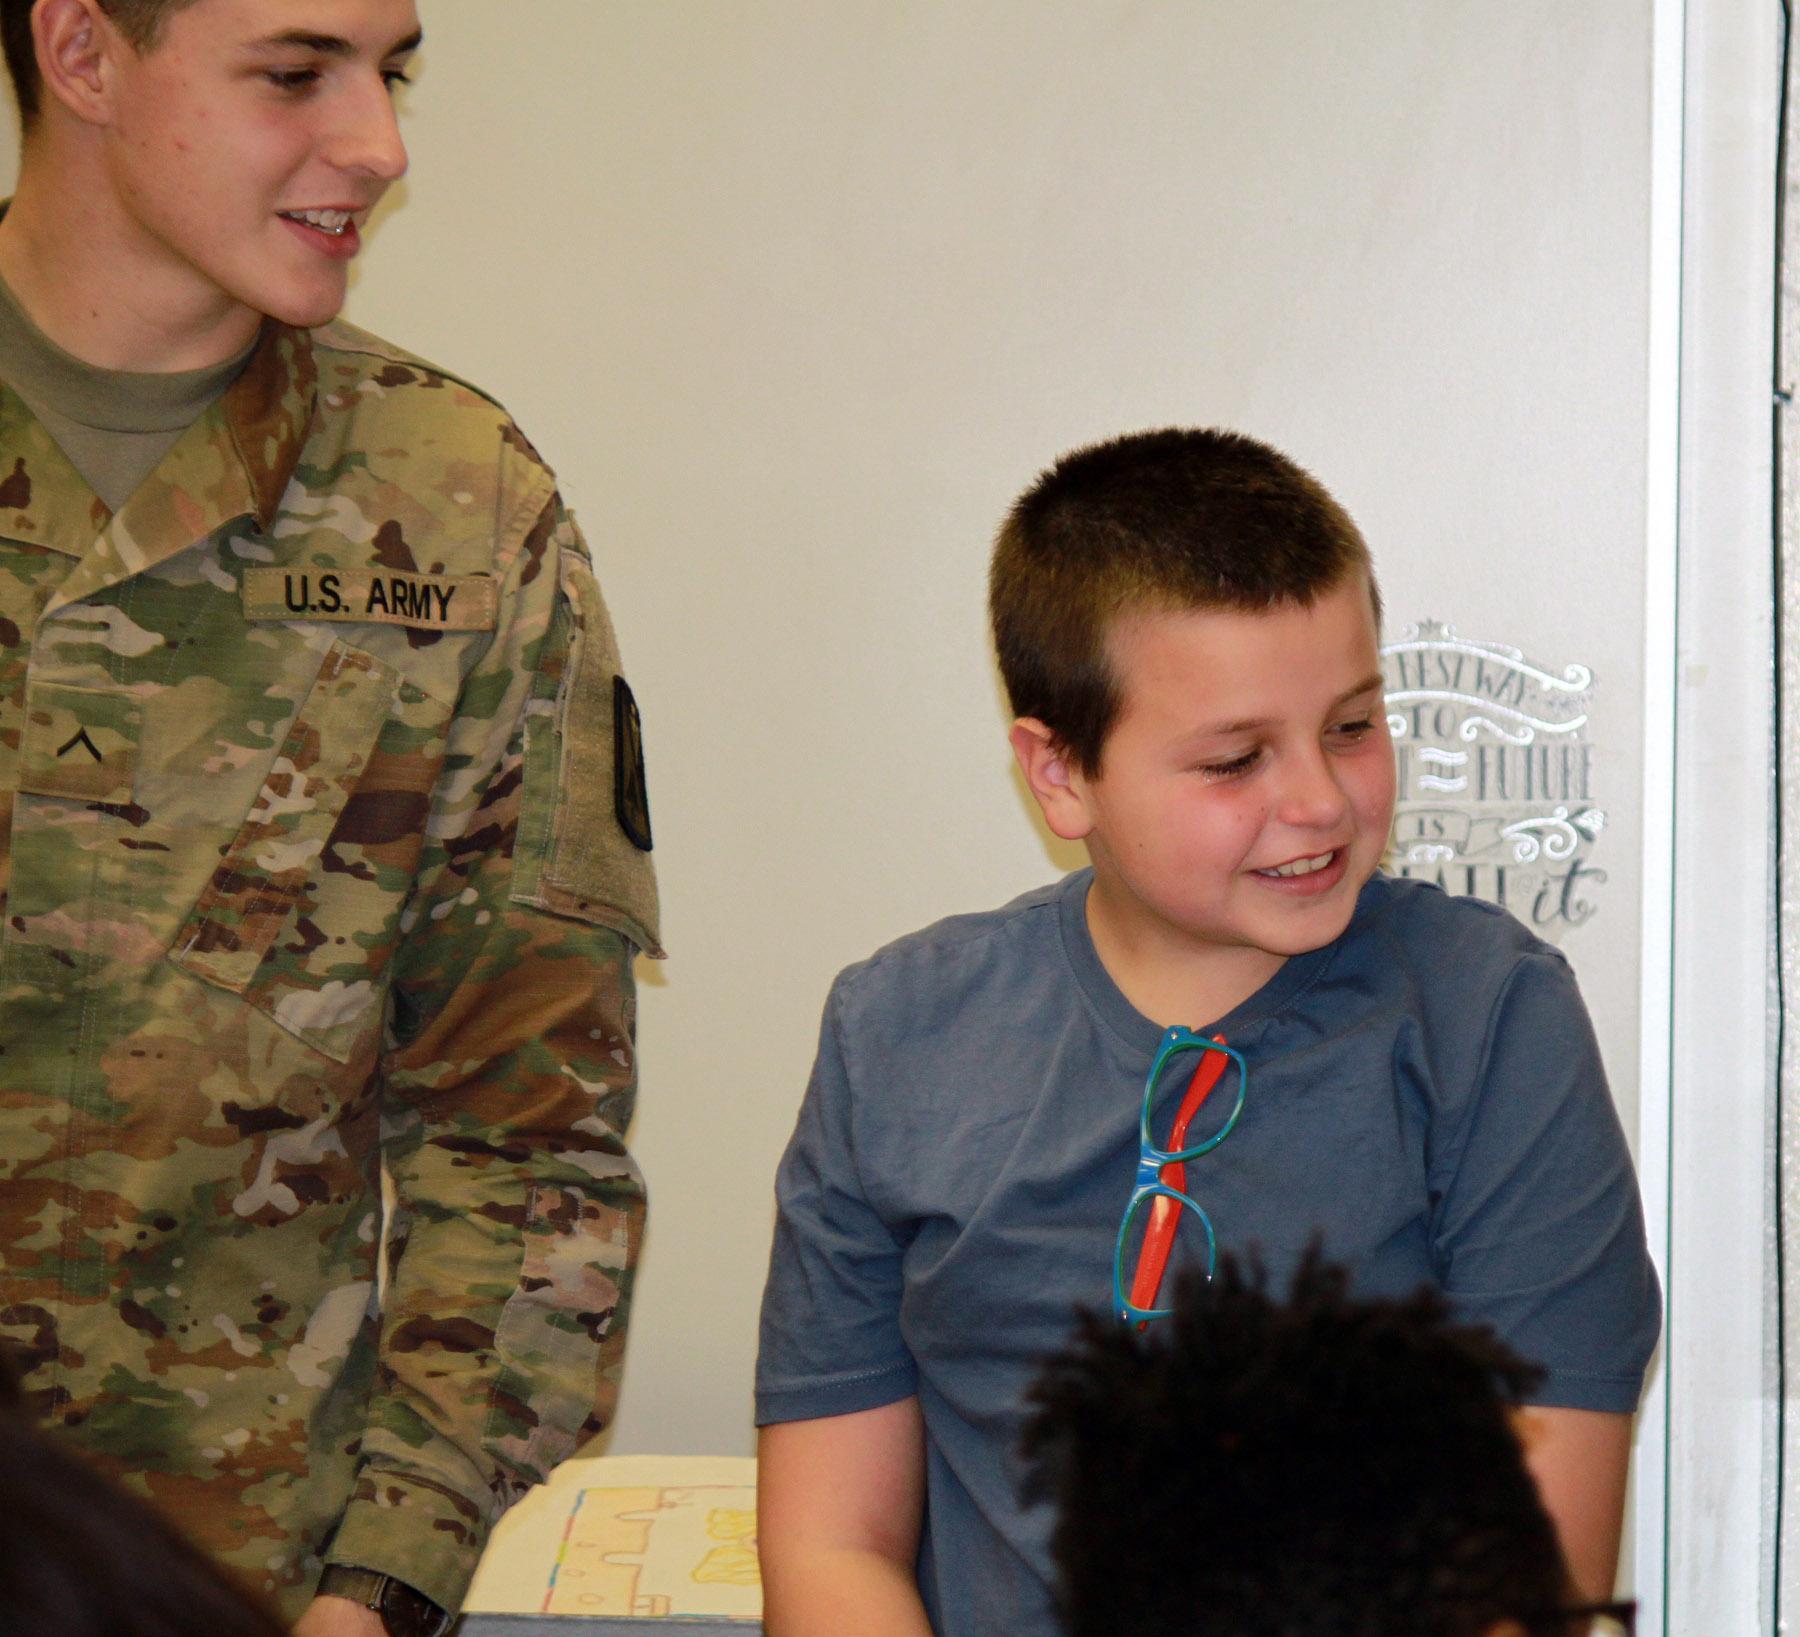 LMS Soldier Visit - 122217